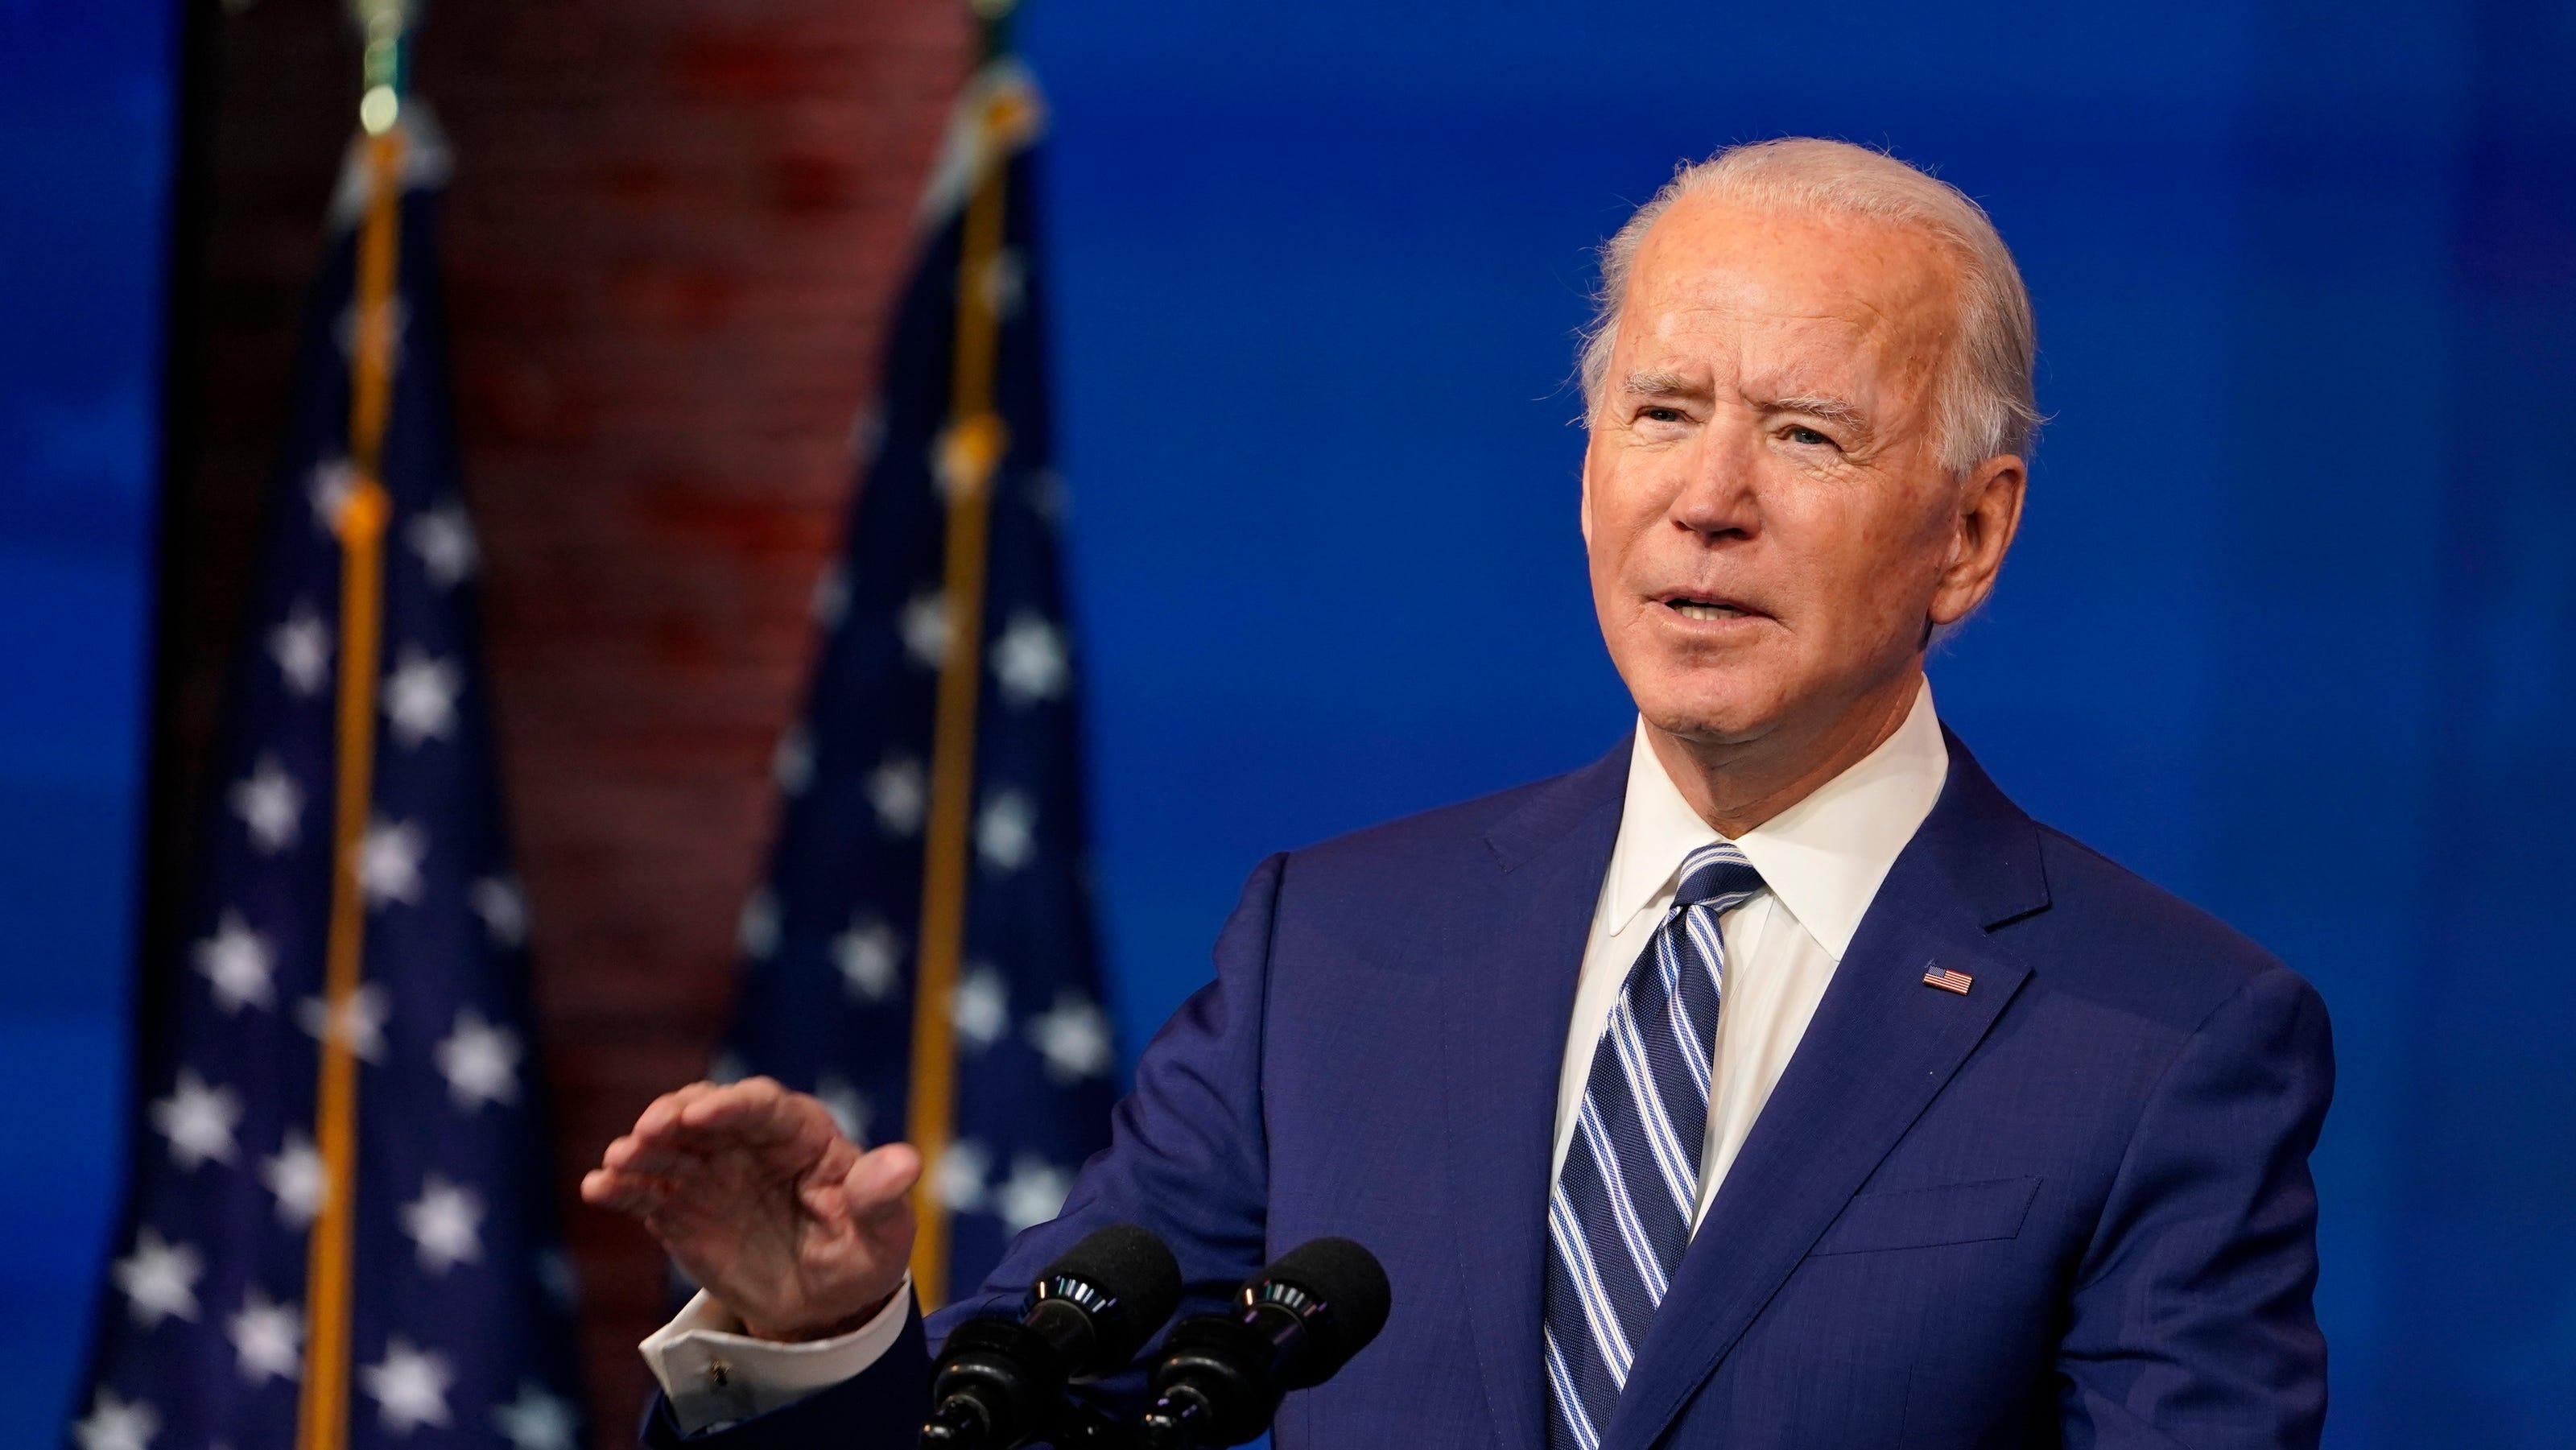 www.usatoday.com: Politics live updates: Biden to pick Katherine Tai as top trade envoy